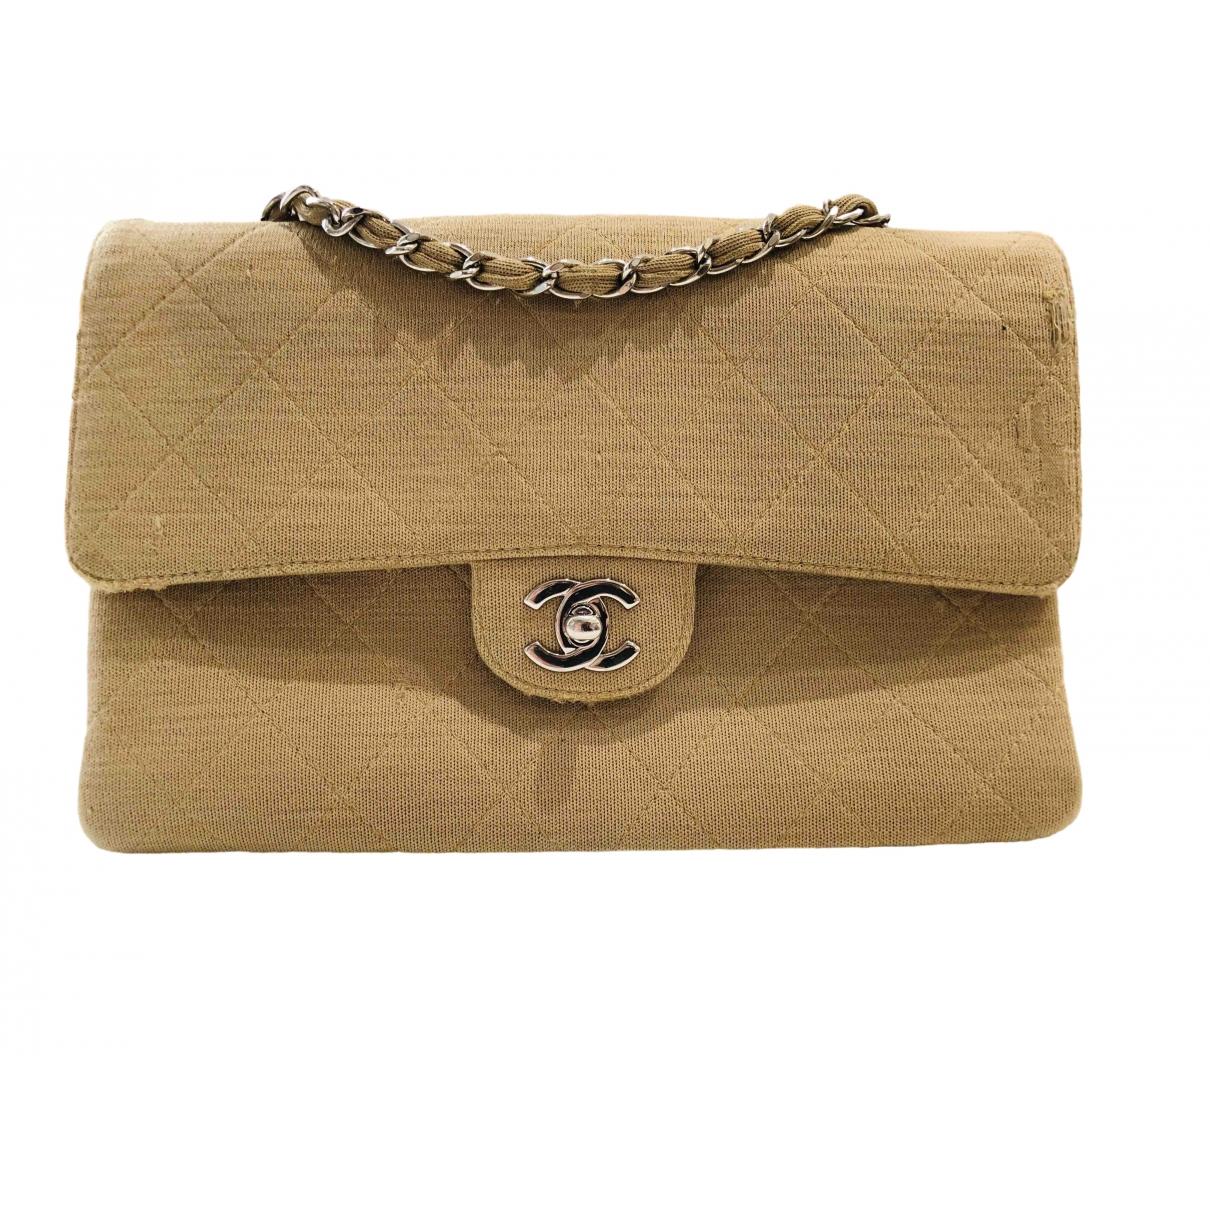 Bolsos clutch Timeless/Classique en Algodon Camel Chanel